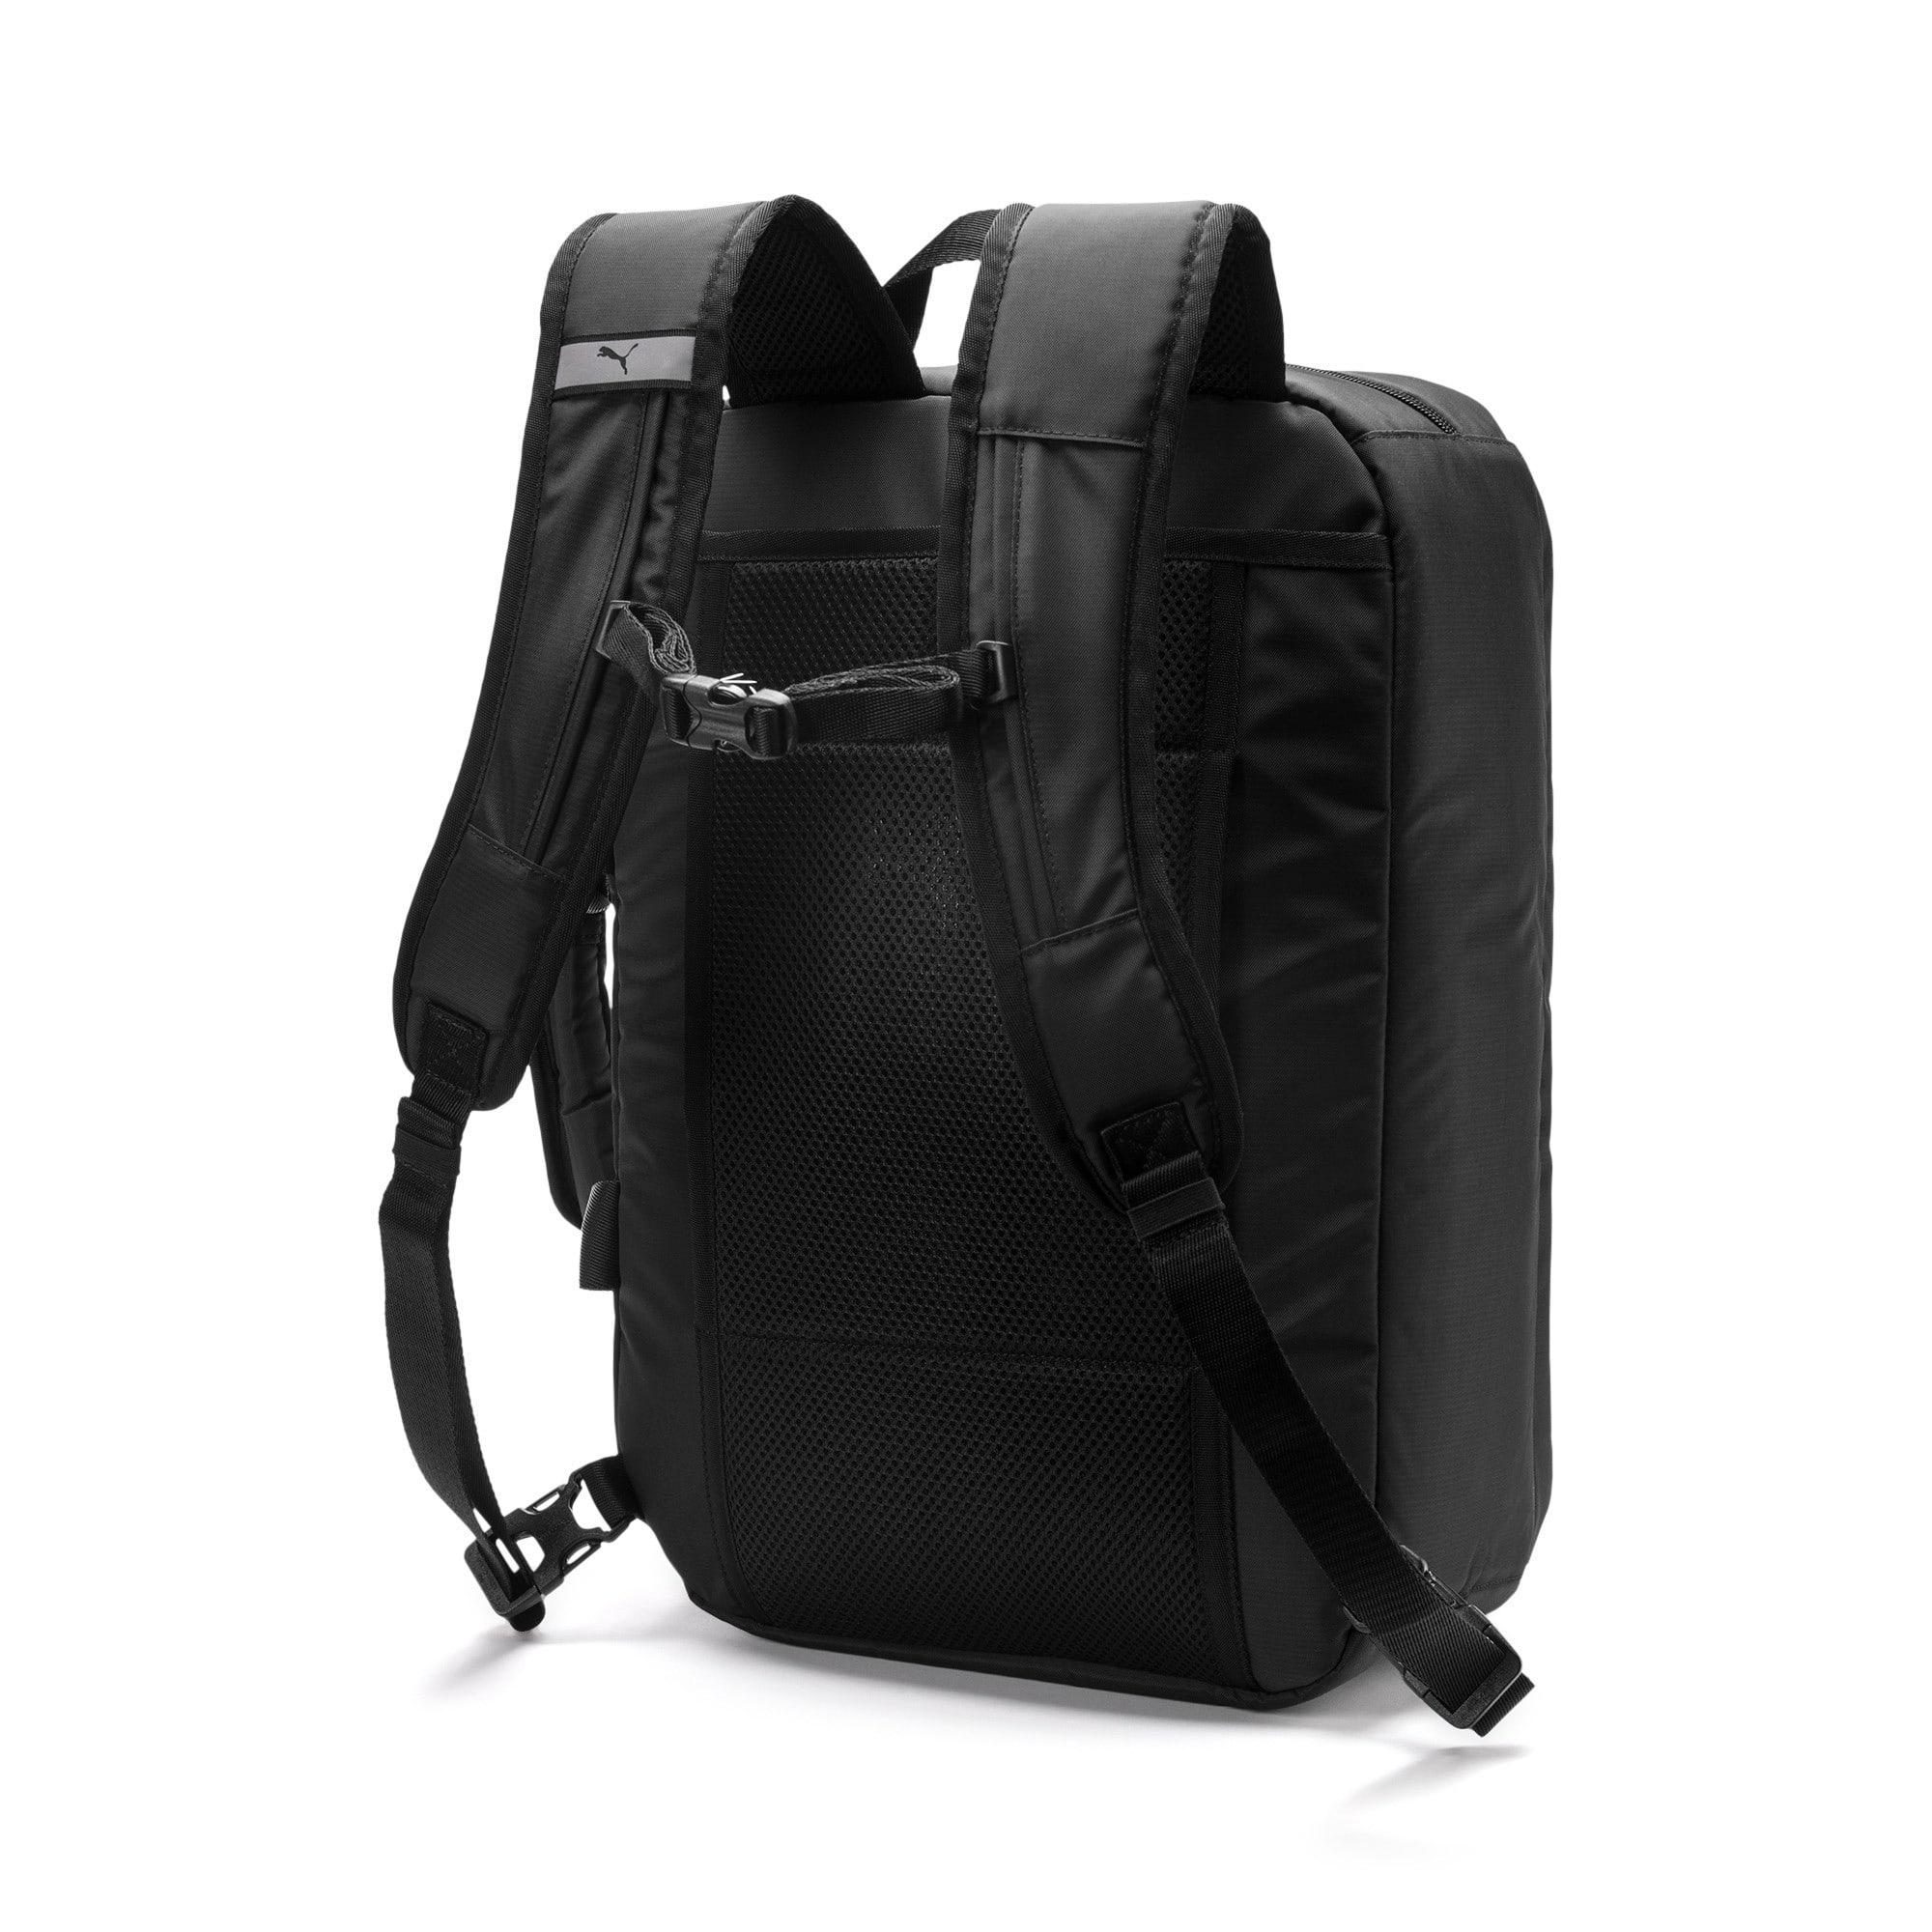 Thumbnail 2 of Ferrari Lifestyle RCT Backpack, Puma Black, medium-IND